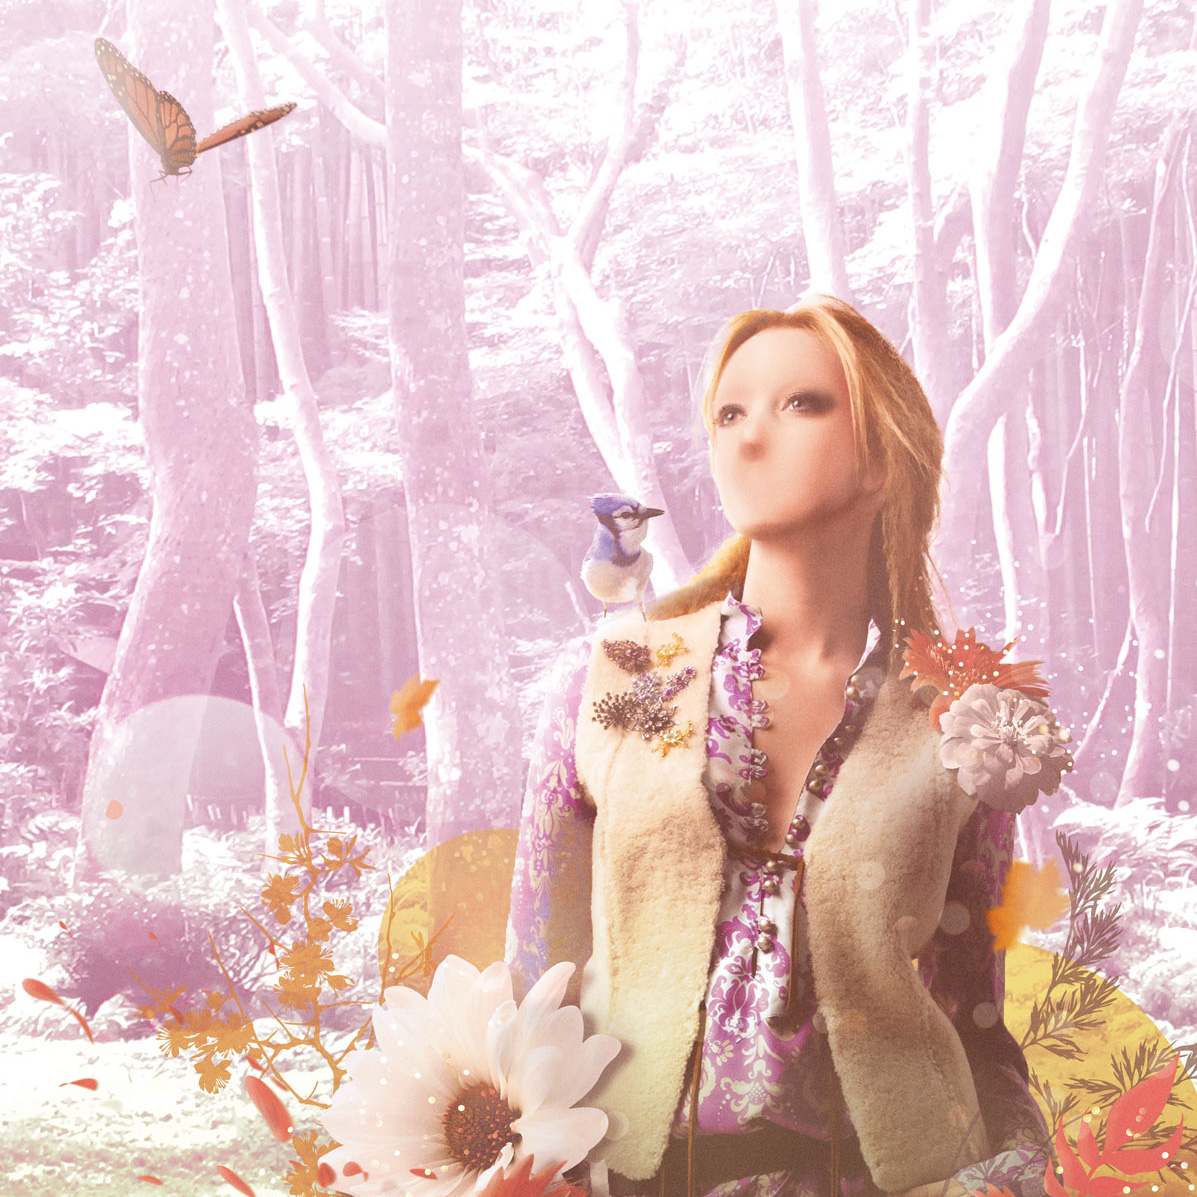 Nature wild photomontage artwork girl Photo Manipulation